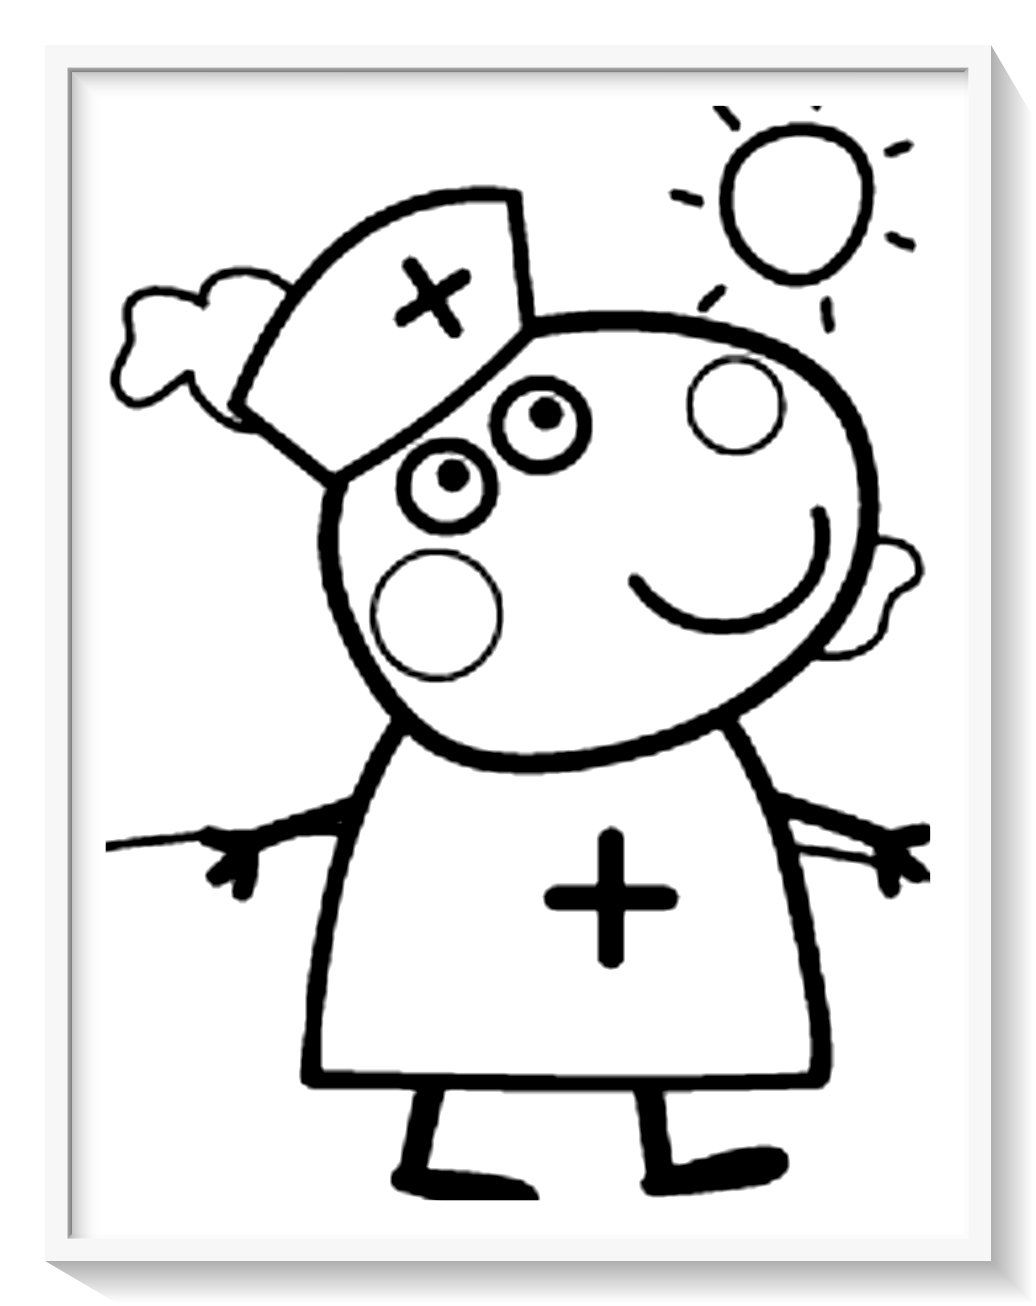 Dibujo Para Colorear Peppa Pig Para Ni 241 Os Peppa Pig